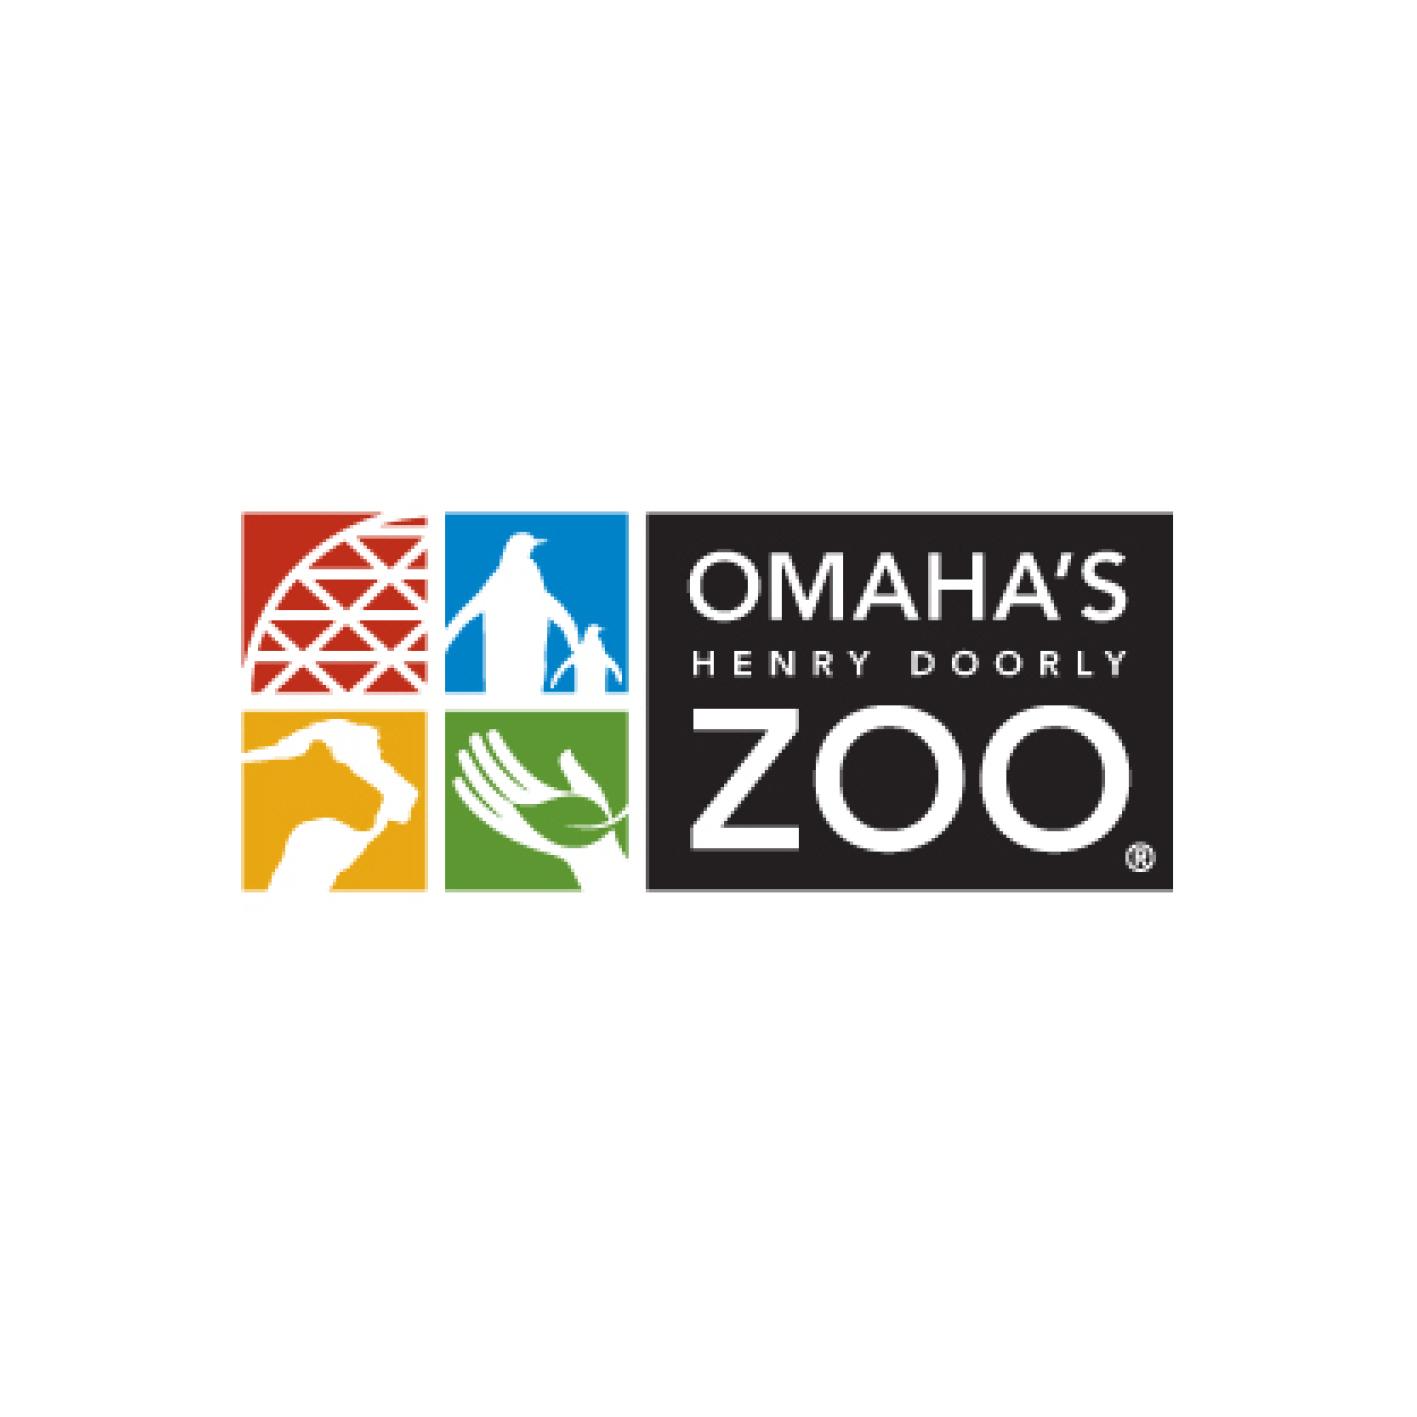 Taylor Penton Handcrafted Logos amp Design Omaha